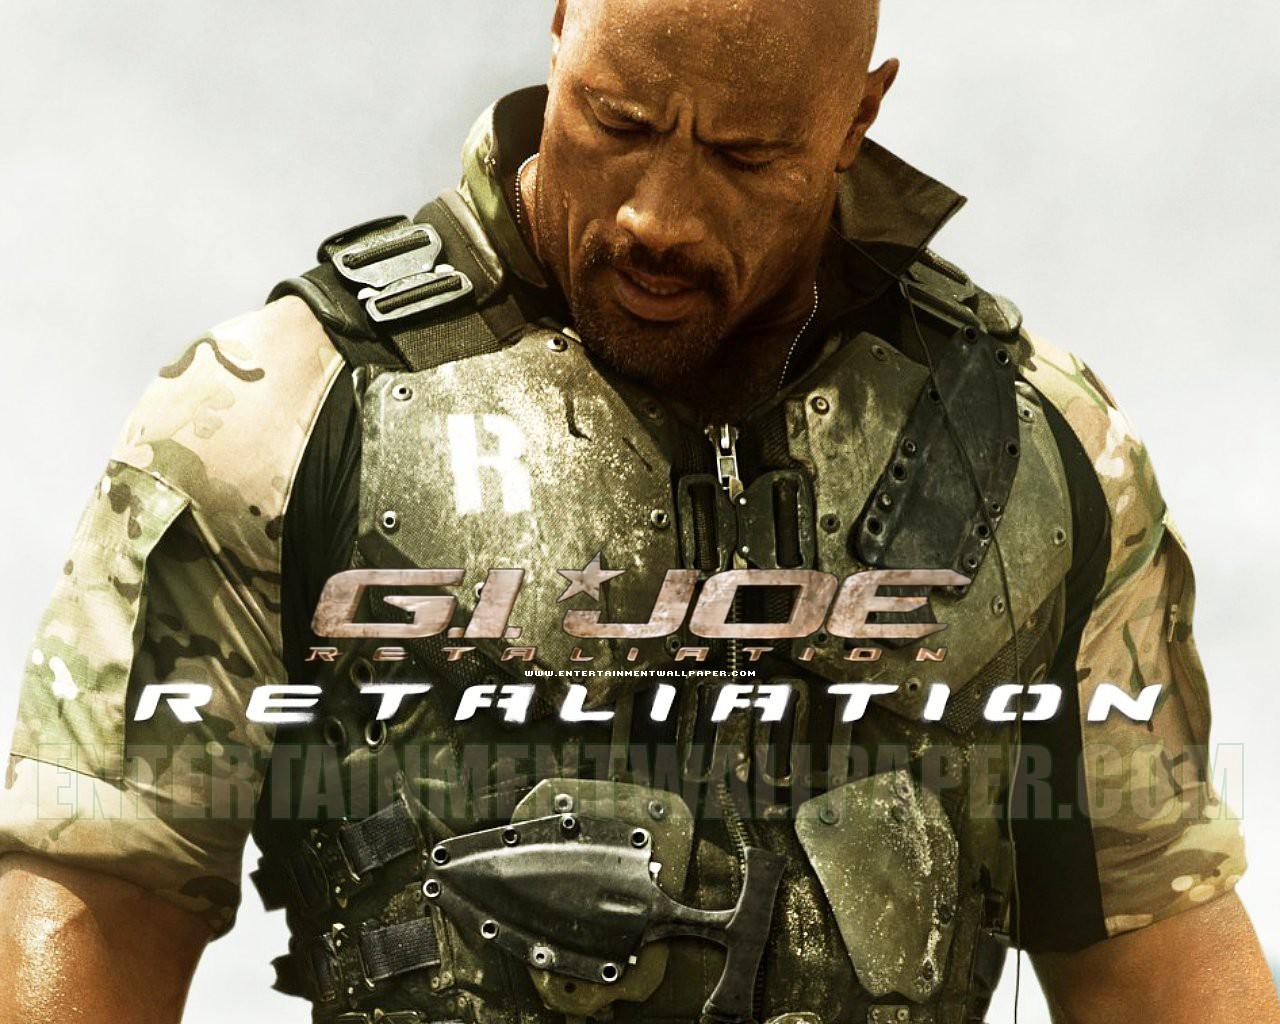 Upcoming Movies G.I. Joe: Retaliation [2013]